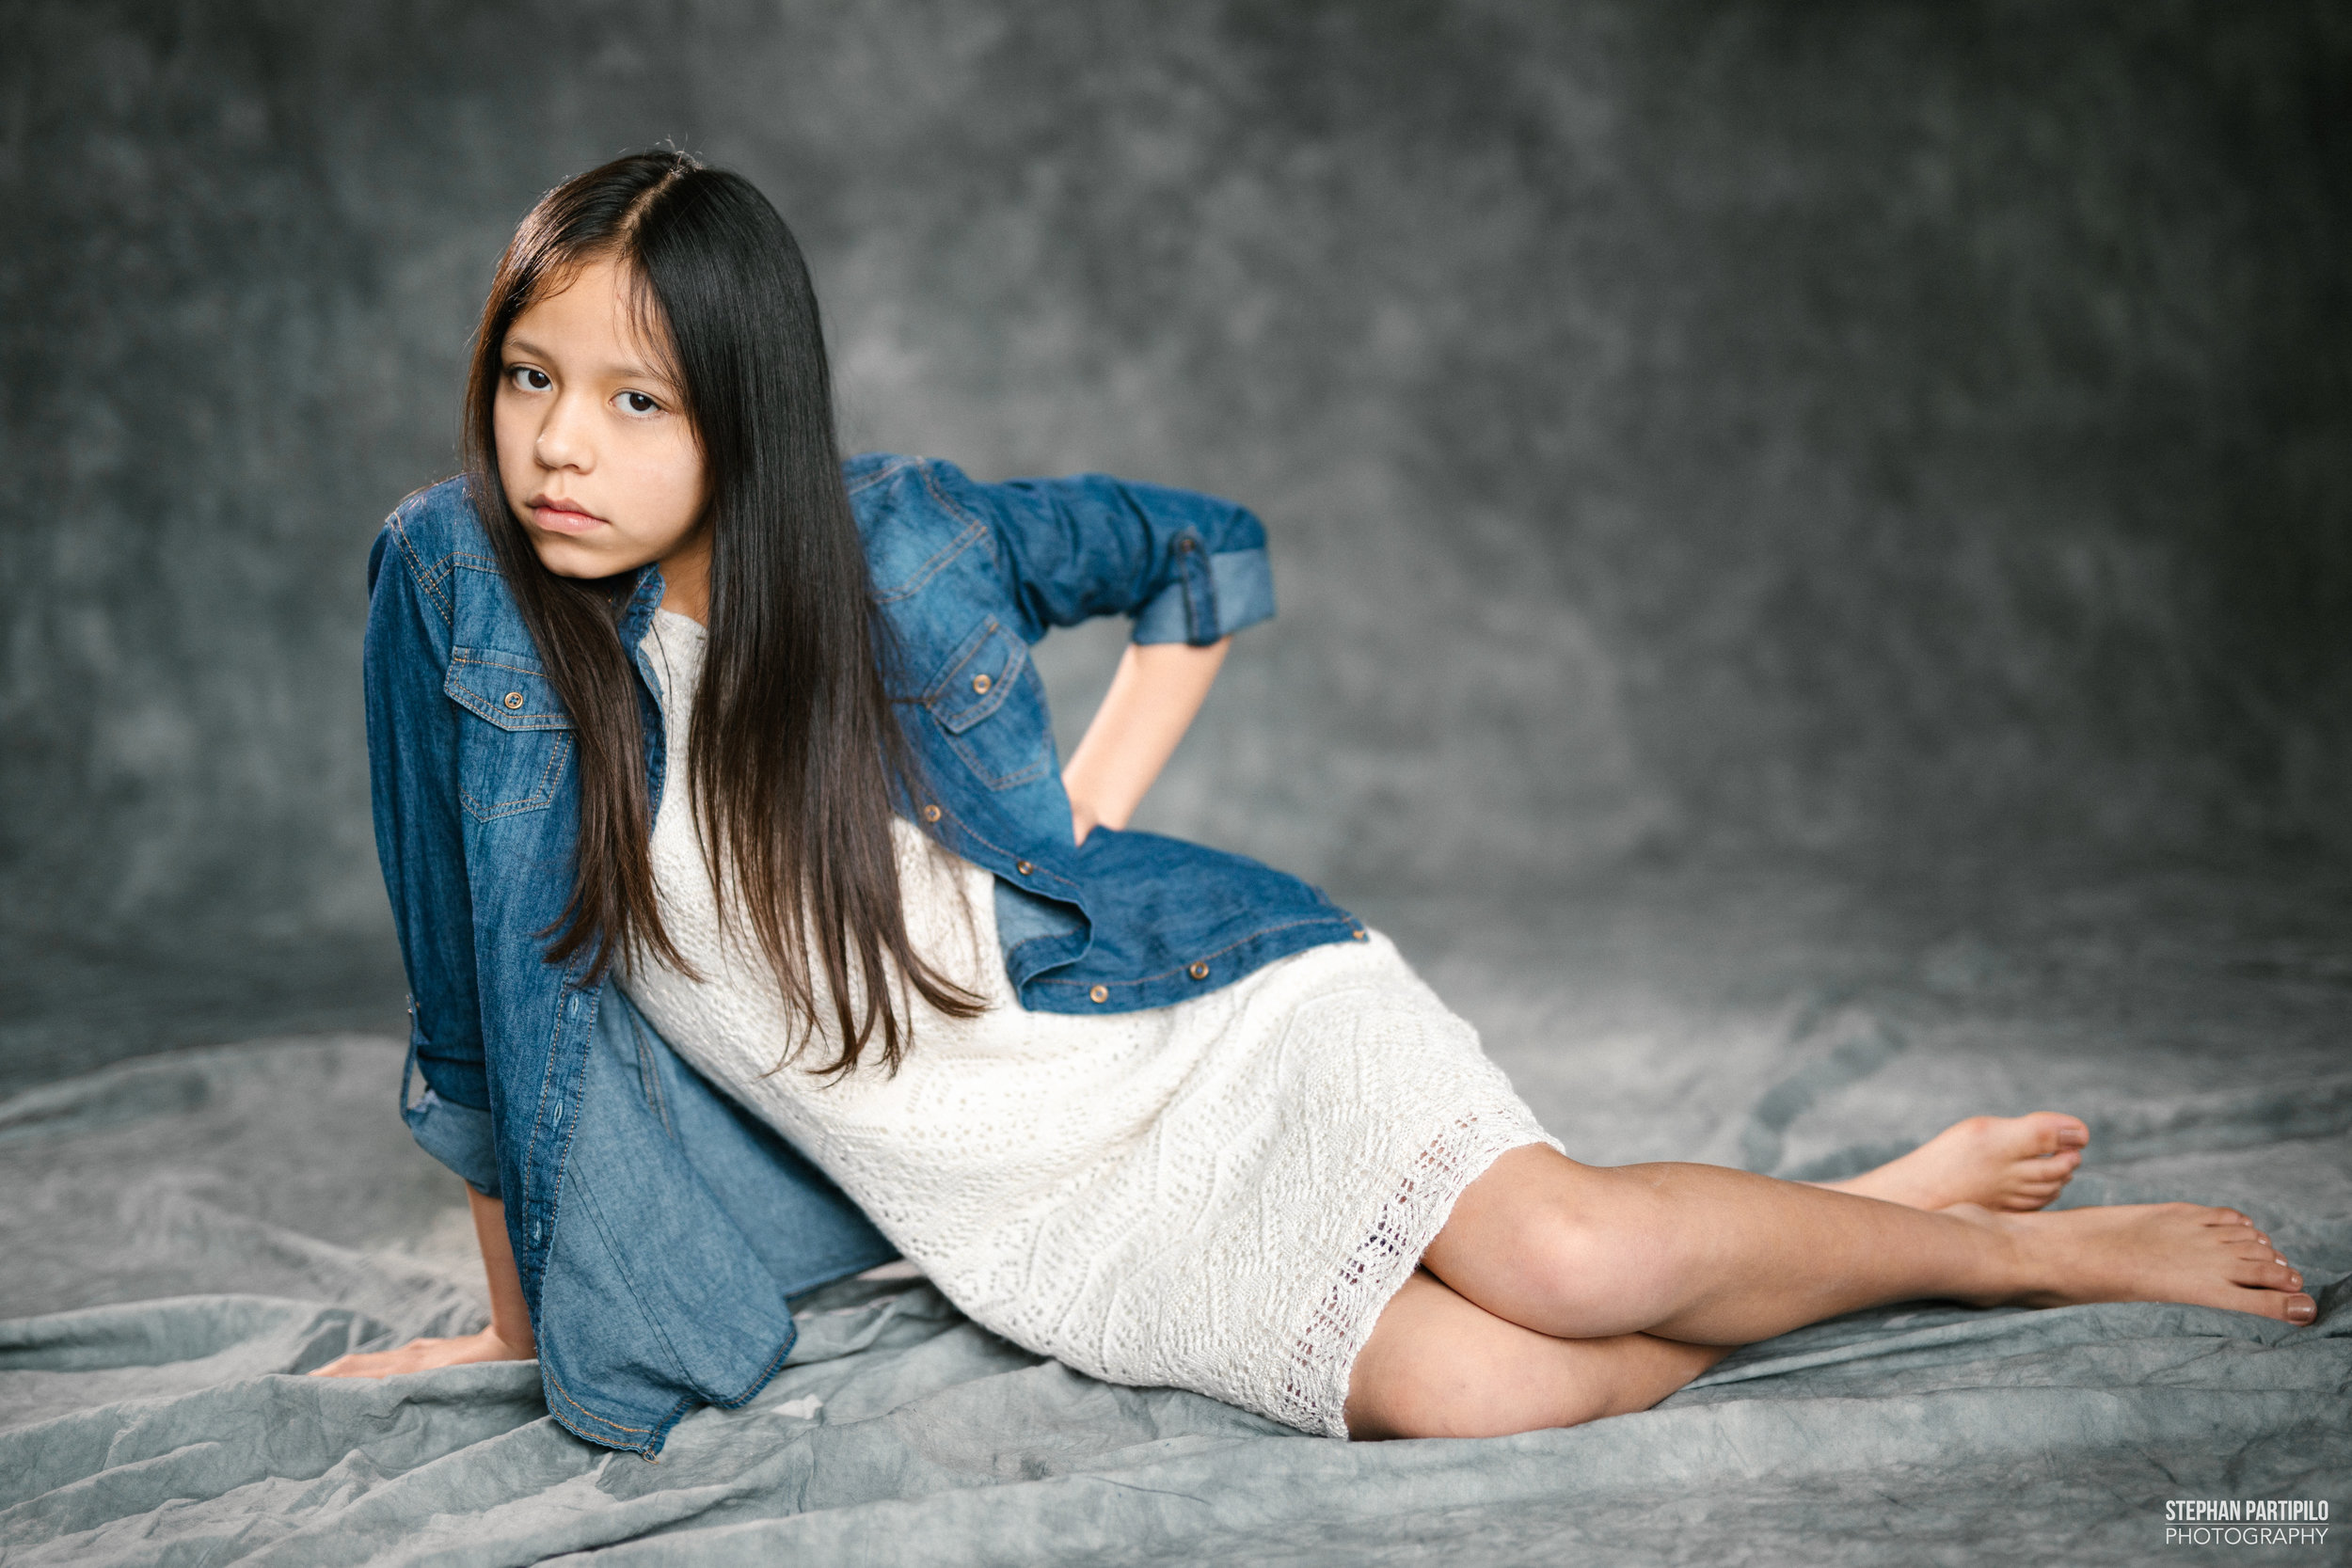 Marisol Child Model PDX 2019 0G5A9408.jpg